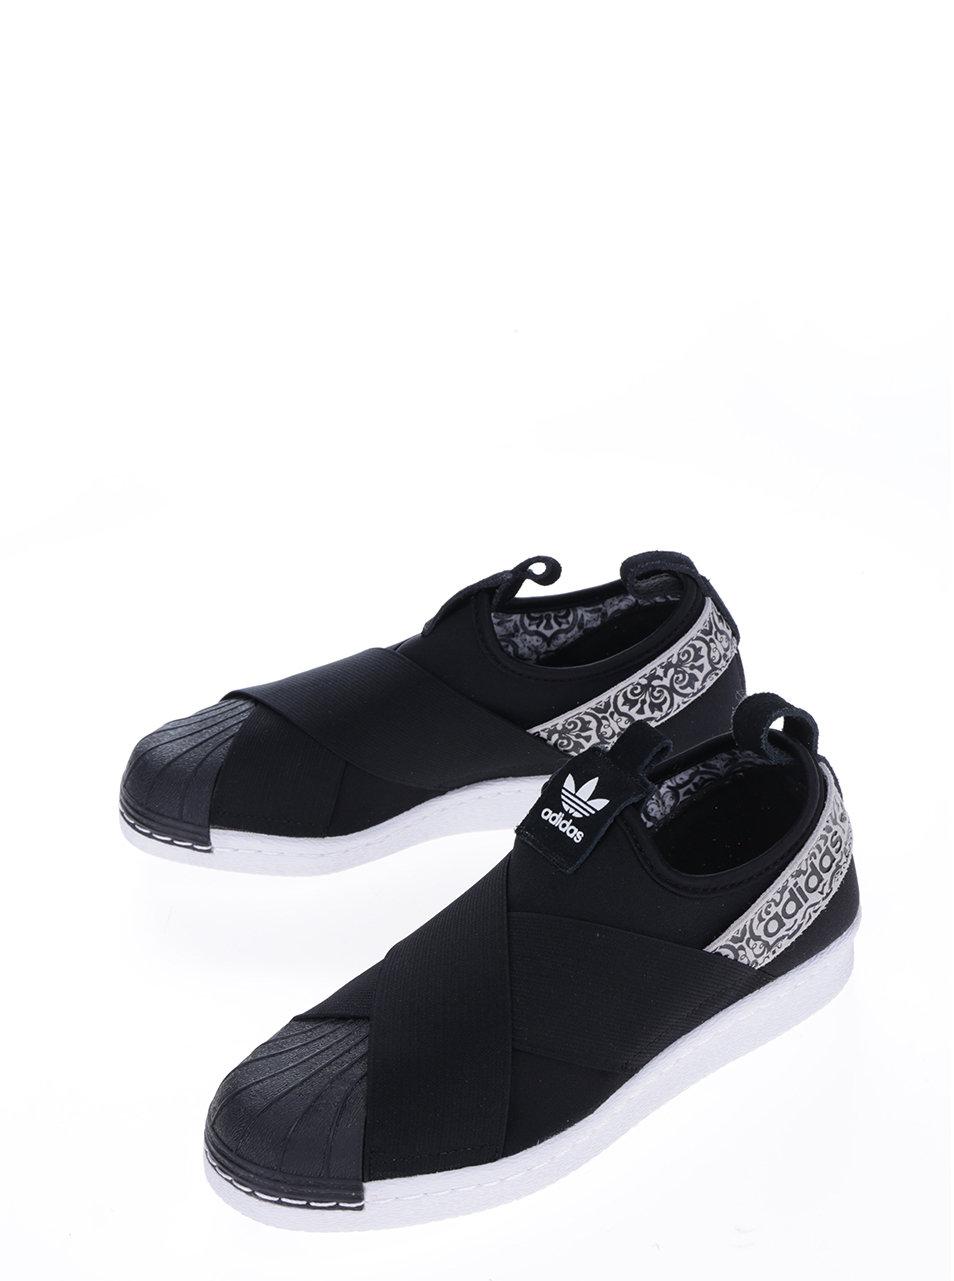 Čierne dámske slip-on tenisky s ozdobným vzorom adidas Originals Superstar  ... 98c162c3f12